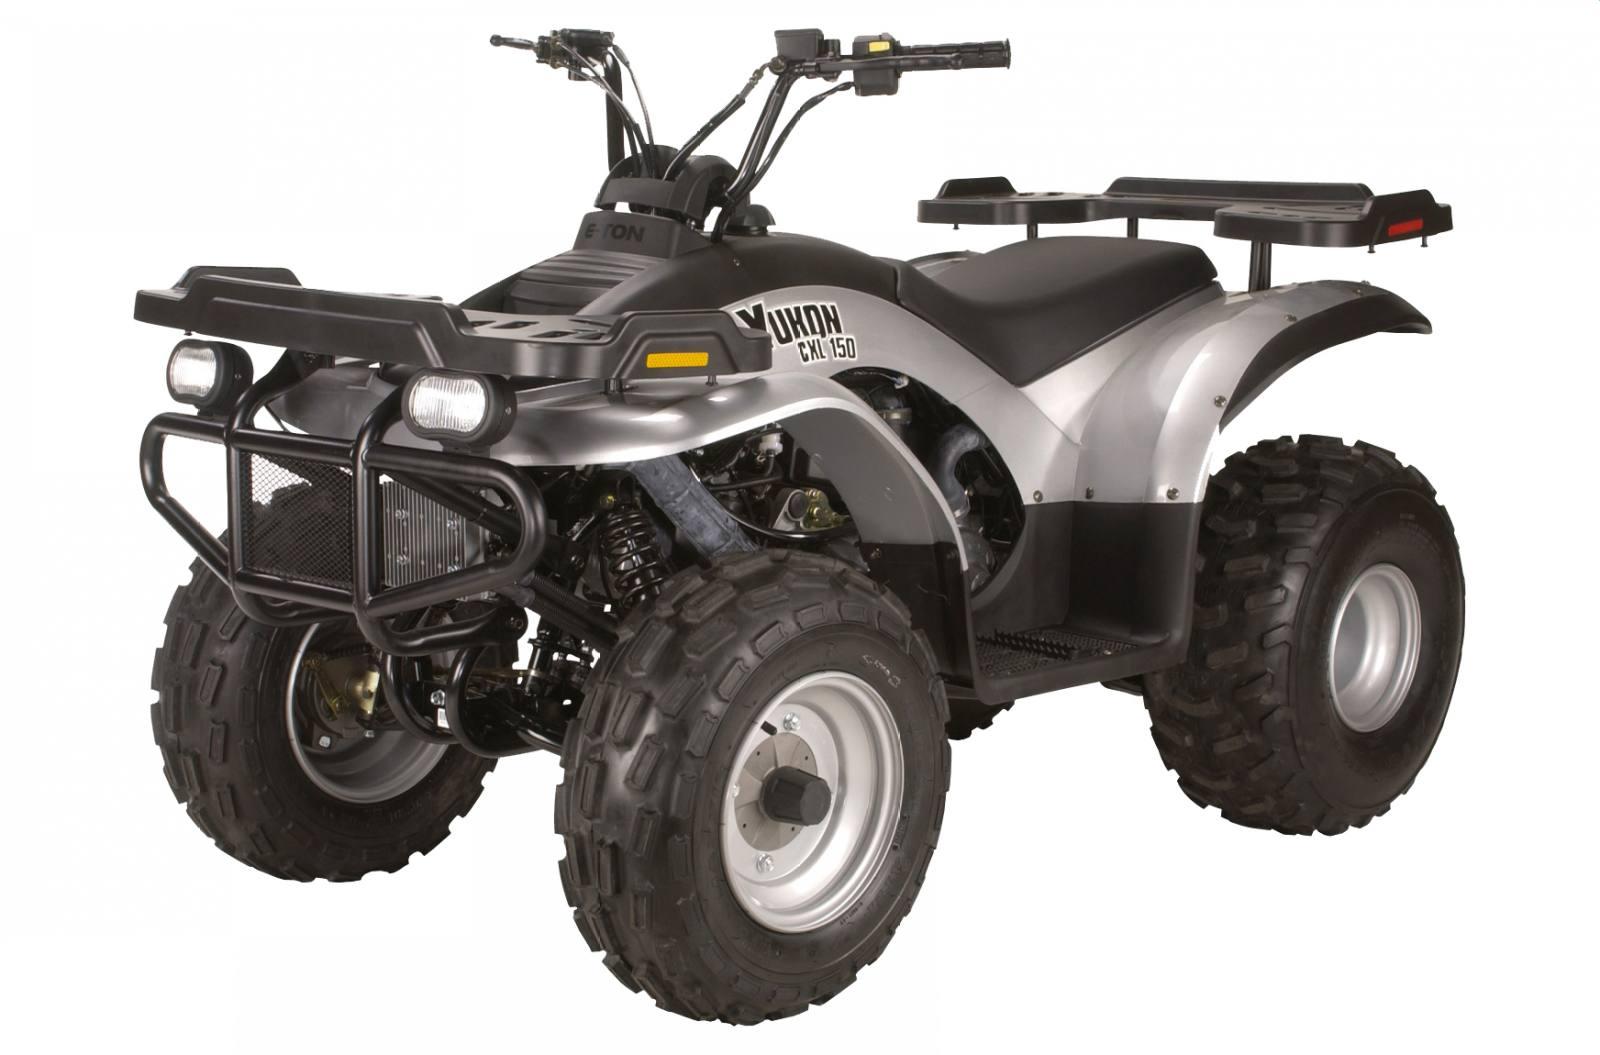 2011 e ton yukon cxl 150 for sale in valdese nc fun cycles inc rh funcycles biz 2000 Eton Yukon 150 ATV Yukon 150 ATV